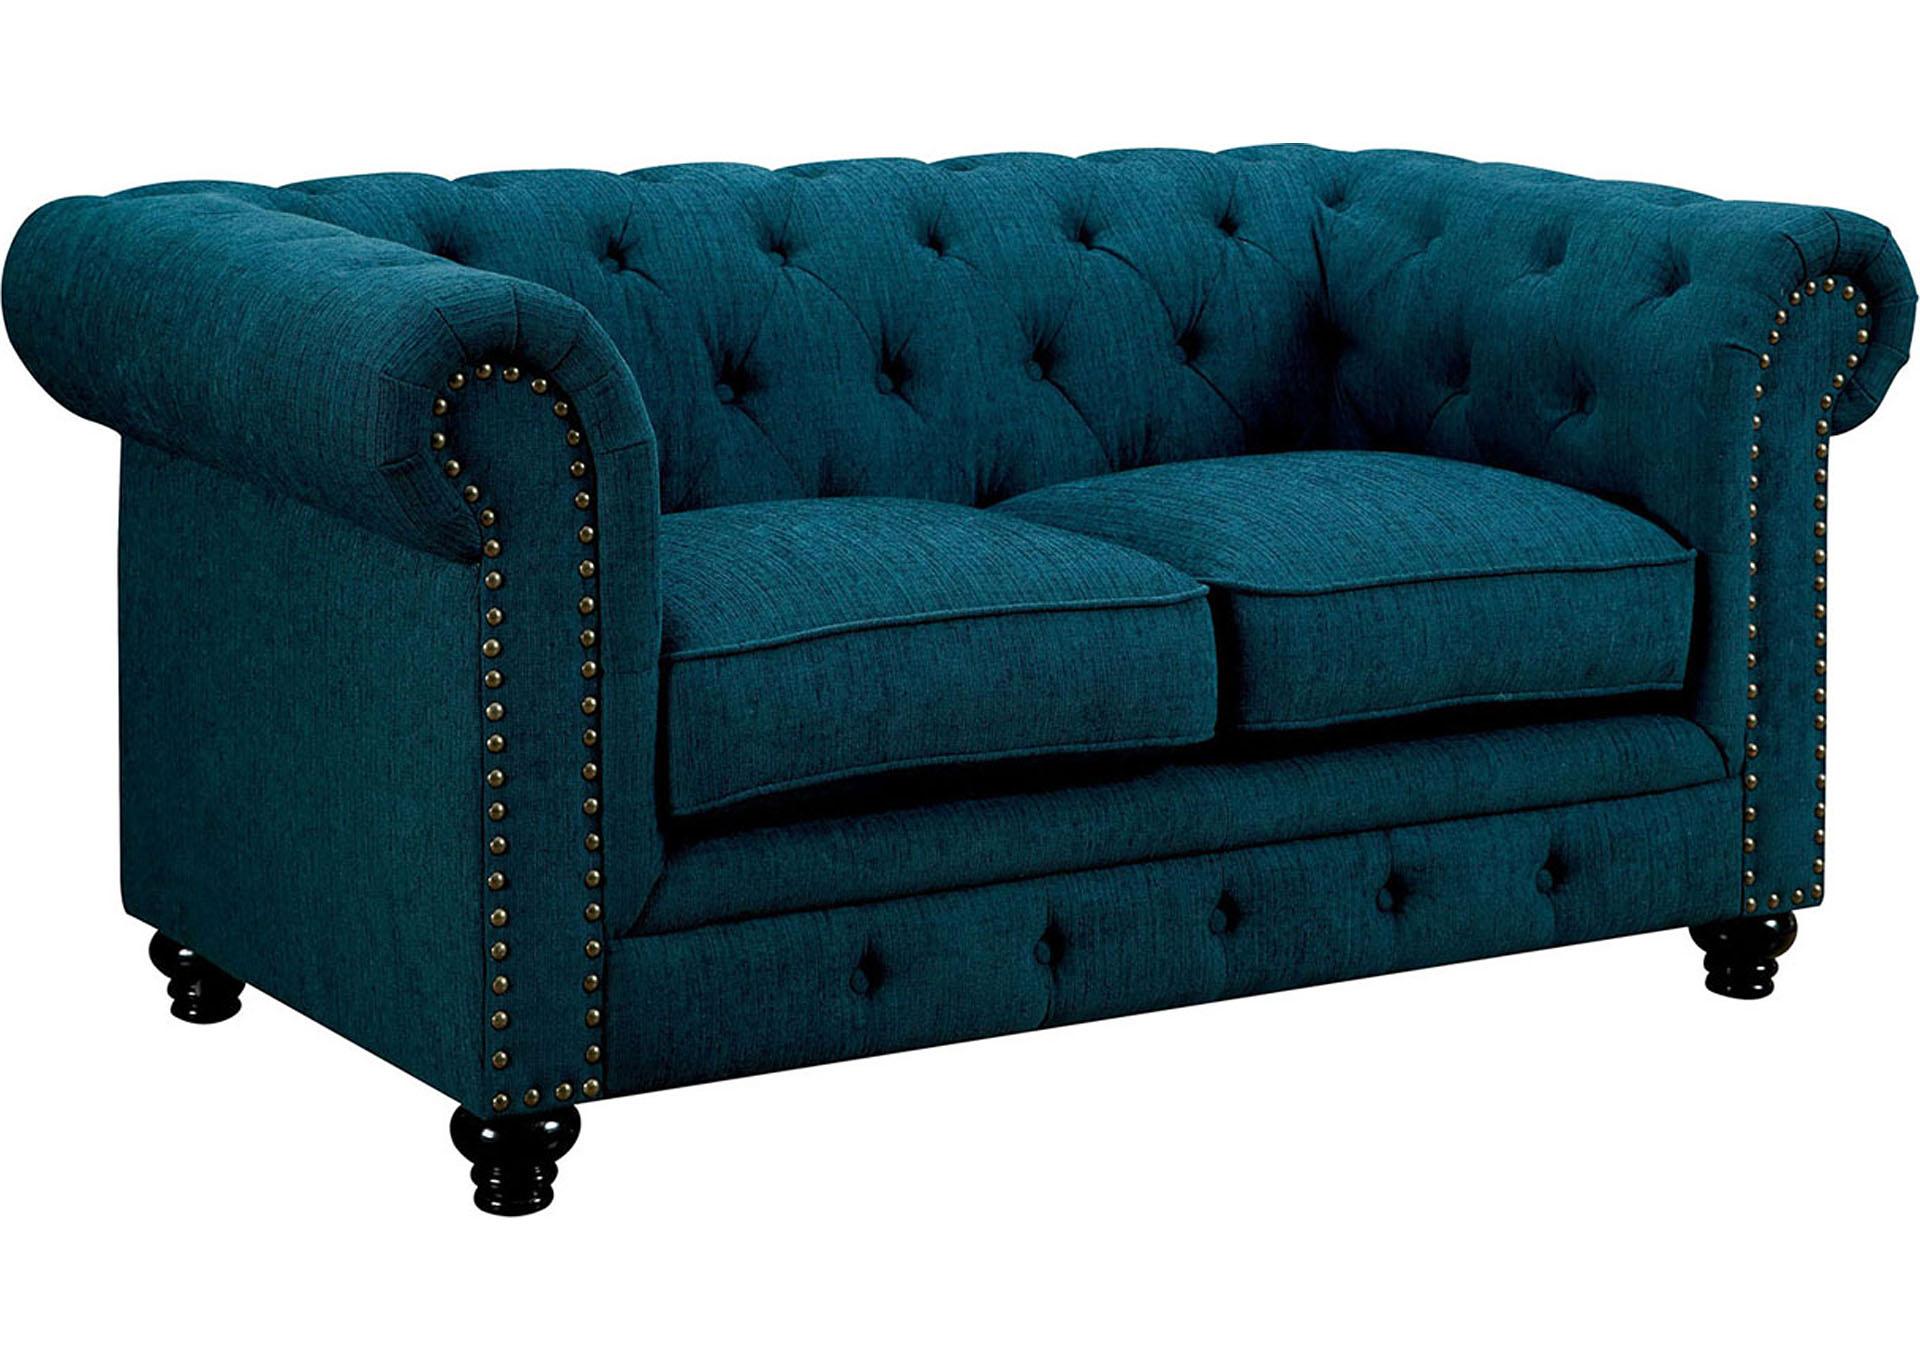 Enjoyable Best Buy Furniture And Mattress Stanford Dark Teal Loveseat Ibusinesslaw Wood Chair Design Ideas Ibusinesslaworg